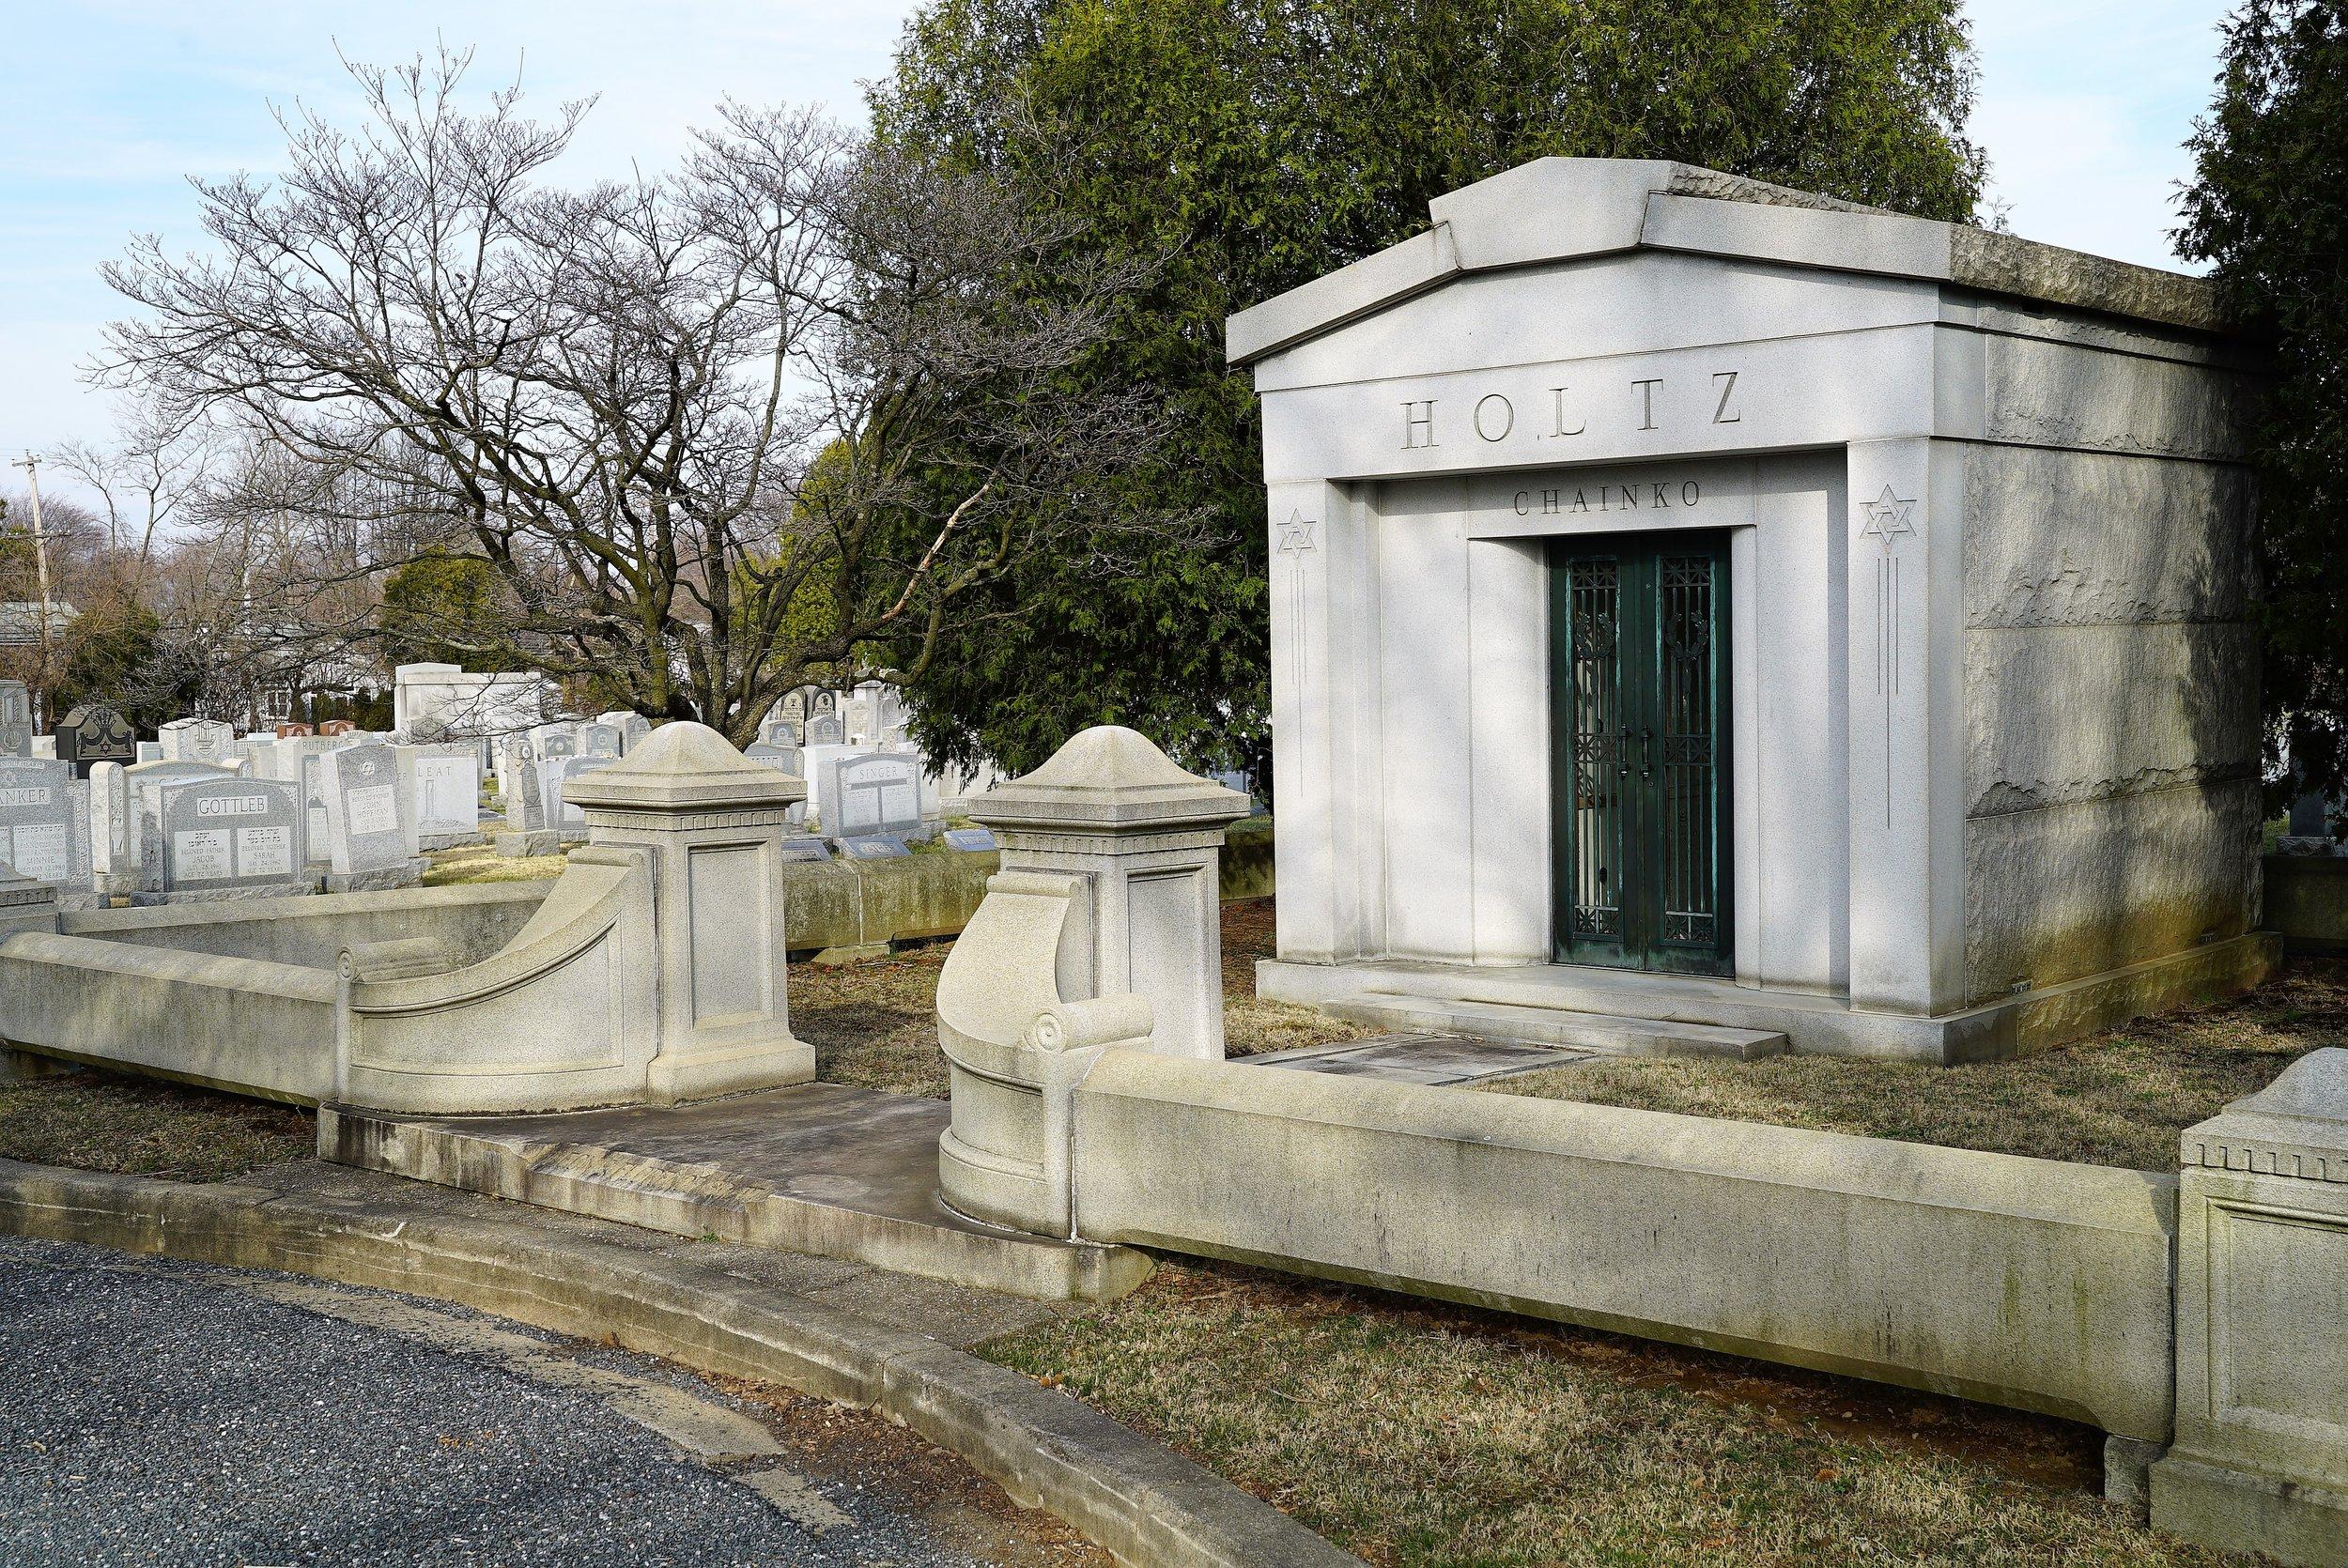 A mausoleum at Mt. Sharon Cemetery, Springfield, Pennsylvania.